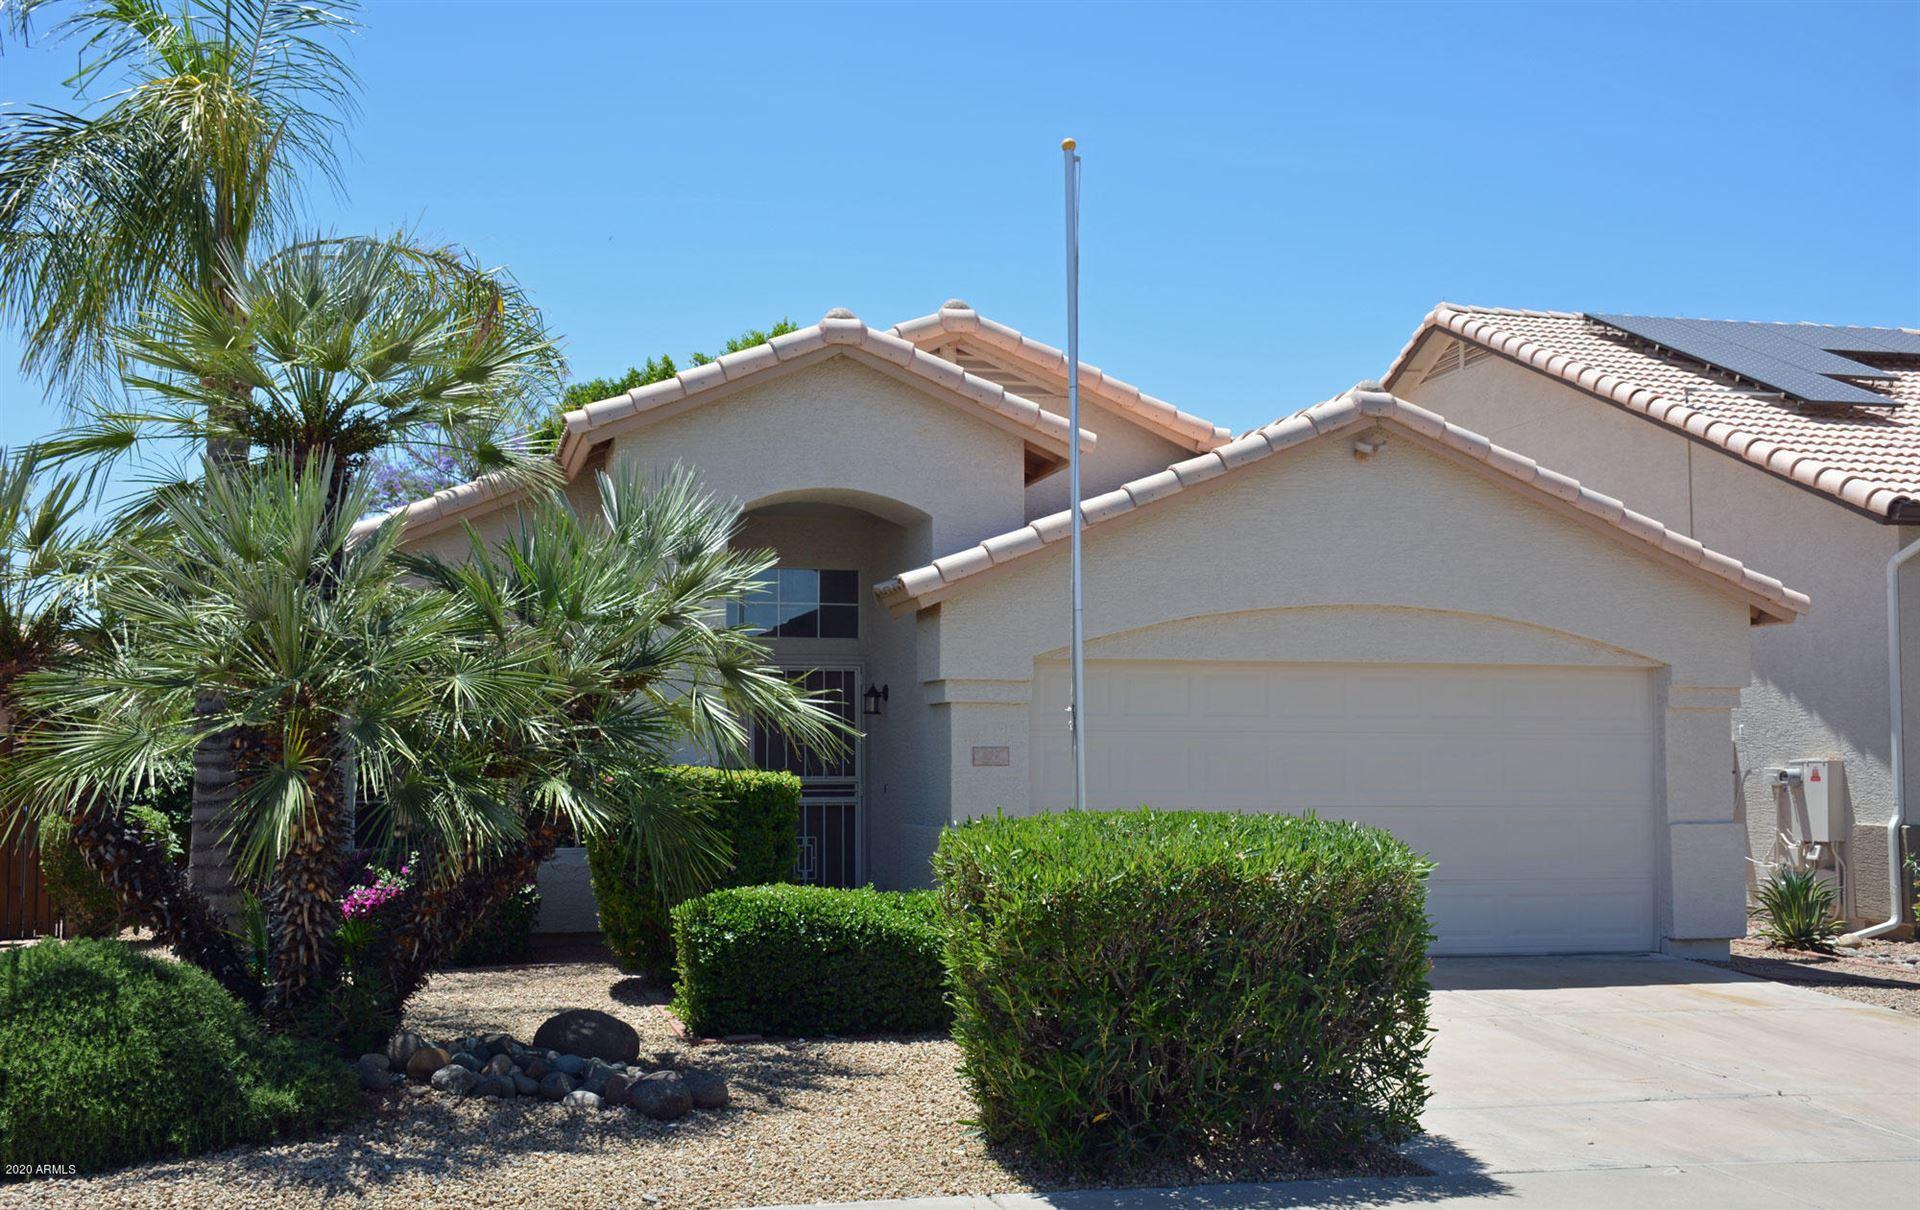 117 W HELENA Drive, Phoenix, AZ 85023 - MLS#: 6079698